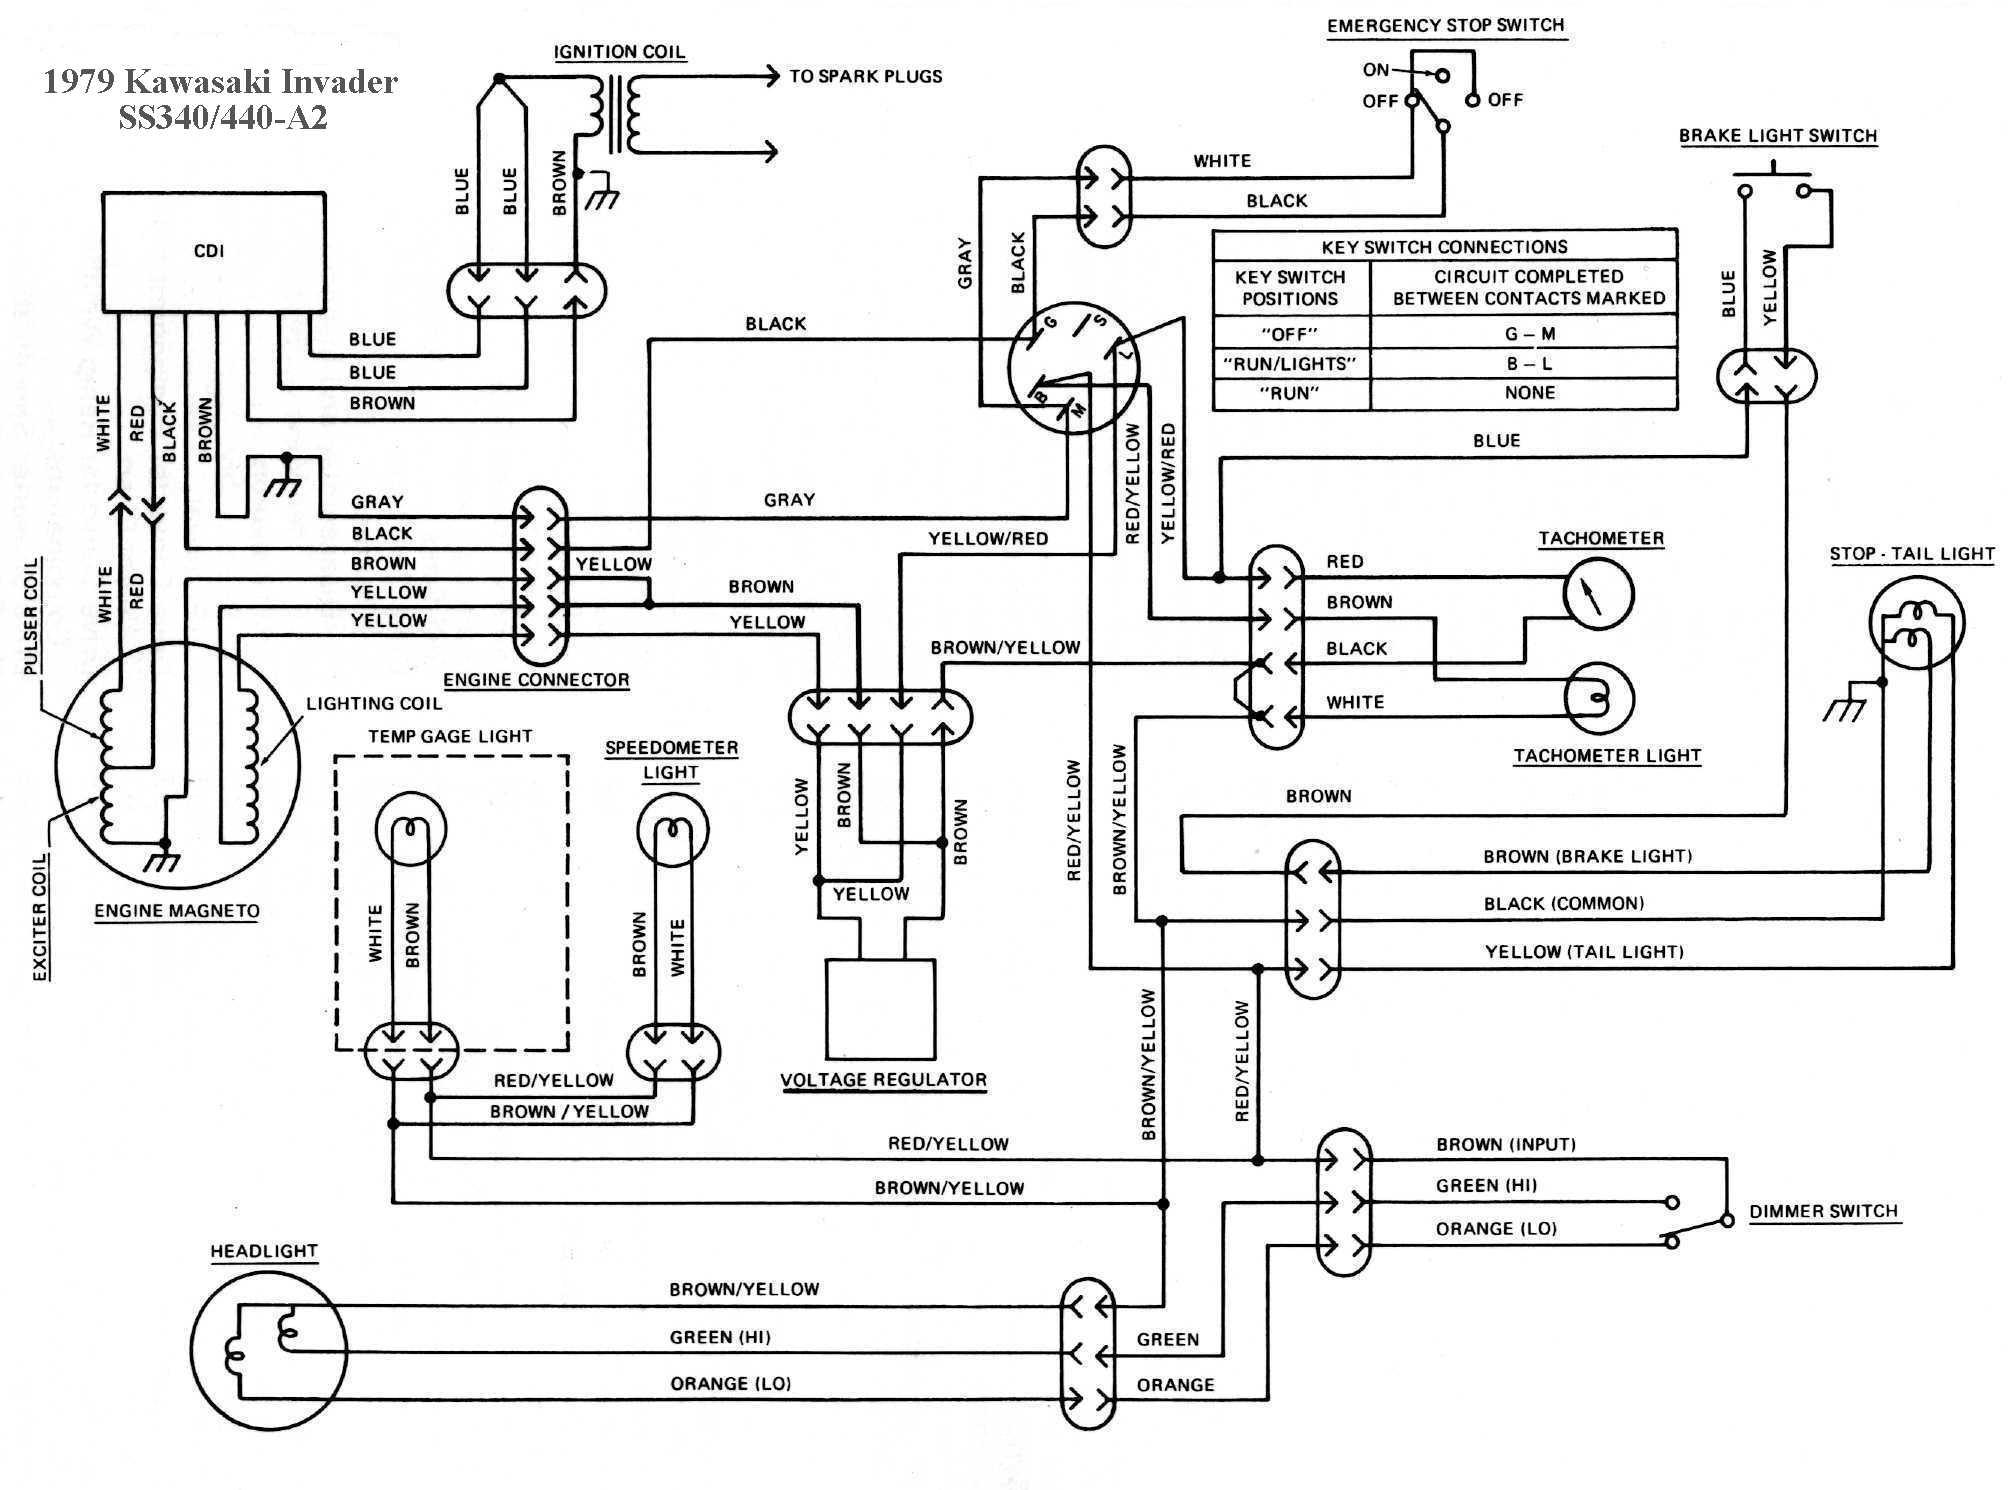 1979 kdx 400 wiring diagram